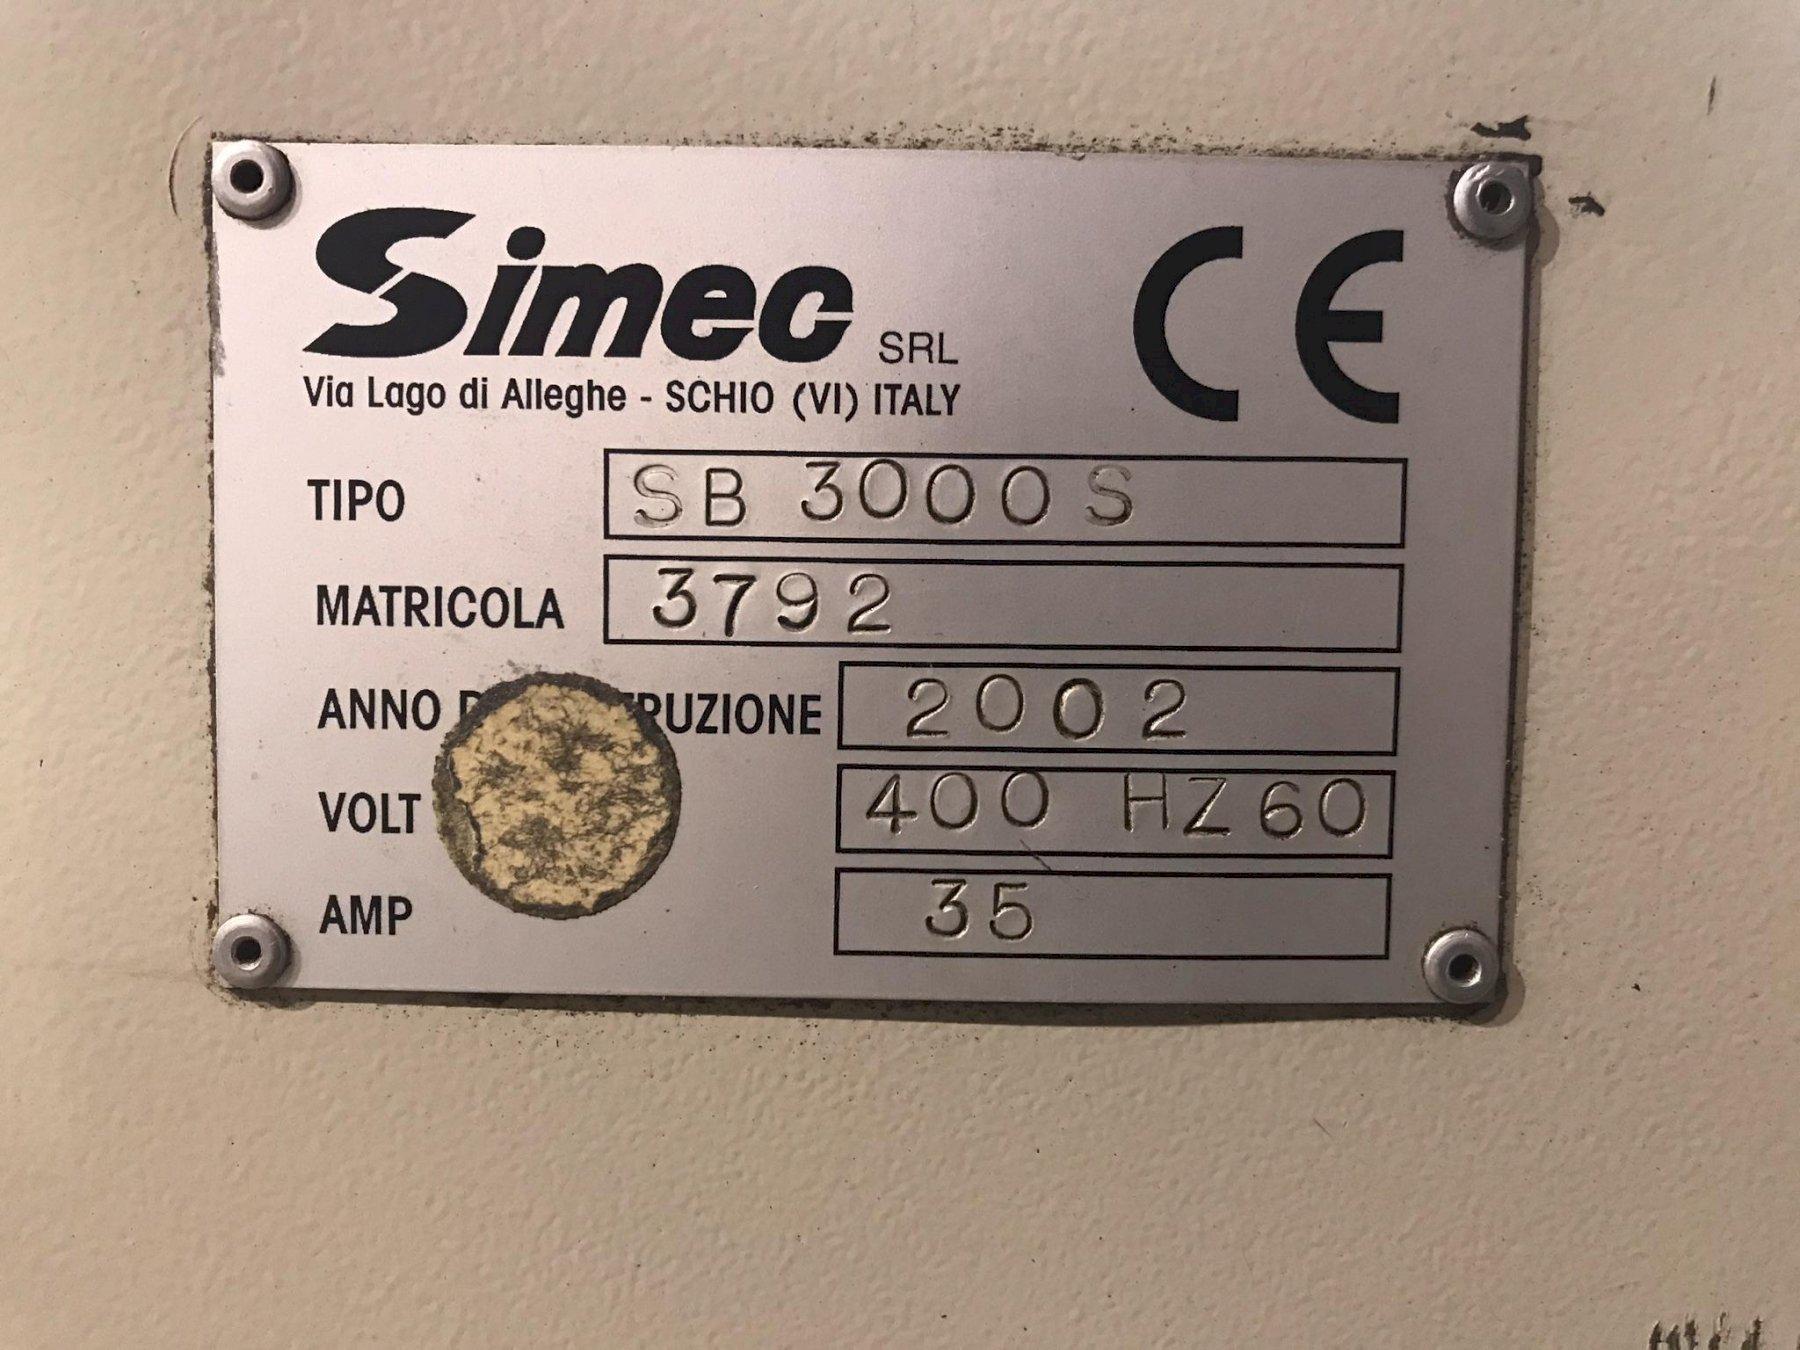 "USED SIMEC ADJUSTABLE LENGTH 4"" WIRE BRUSH DEBURRING MACHINE, MODEL SB3000S, Stock No. 10686, Ye"